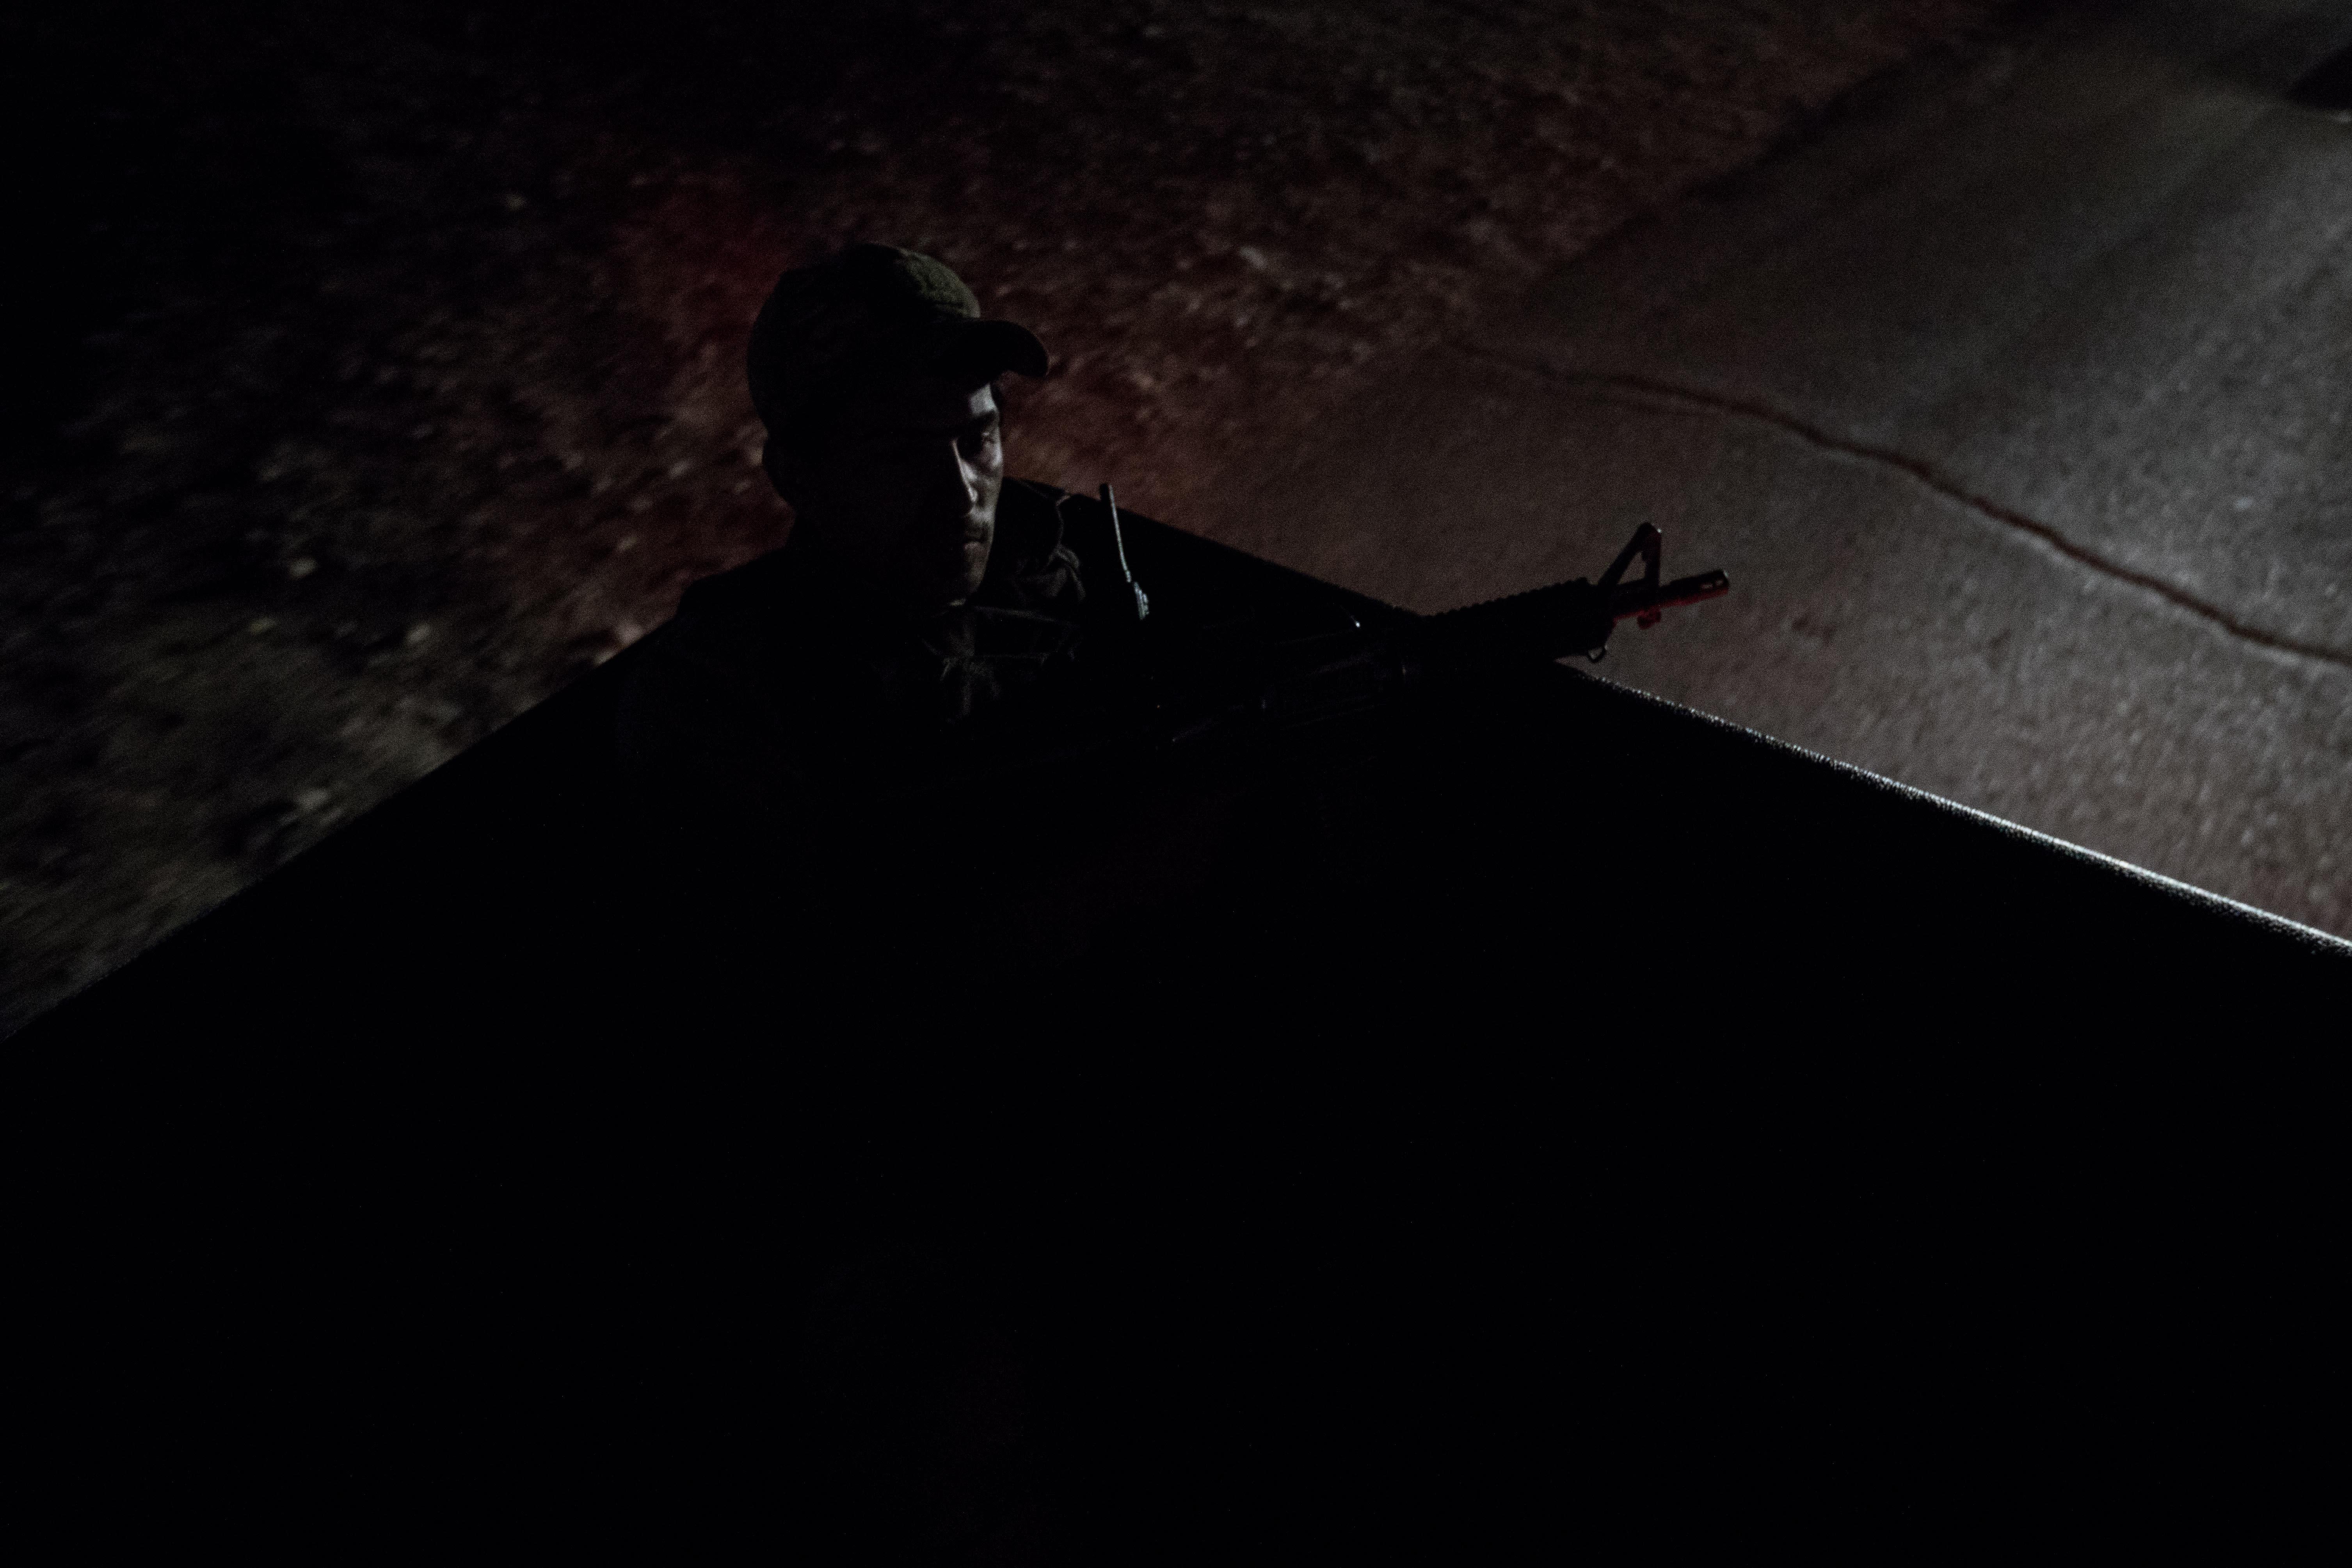 <p><b><em>Baiji, Iraq</em>   </b> A Shia militia Hashd al-Shaabi fighter rides on the back of a pickup truck heading towards a nighttime operation targeting the terrorist militia Islamic State group, which hides in this region. (Photo: Sebastian Backhaus) </p>